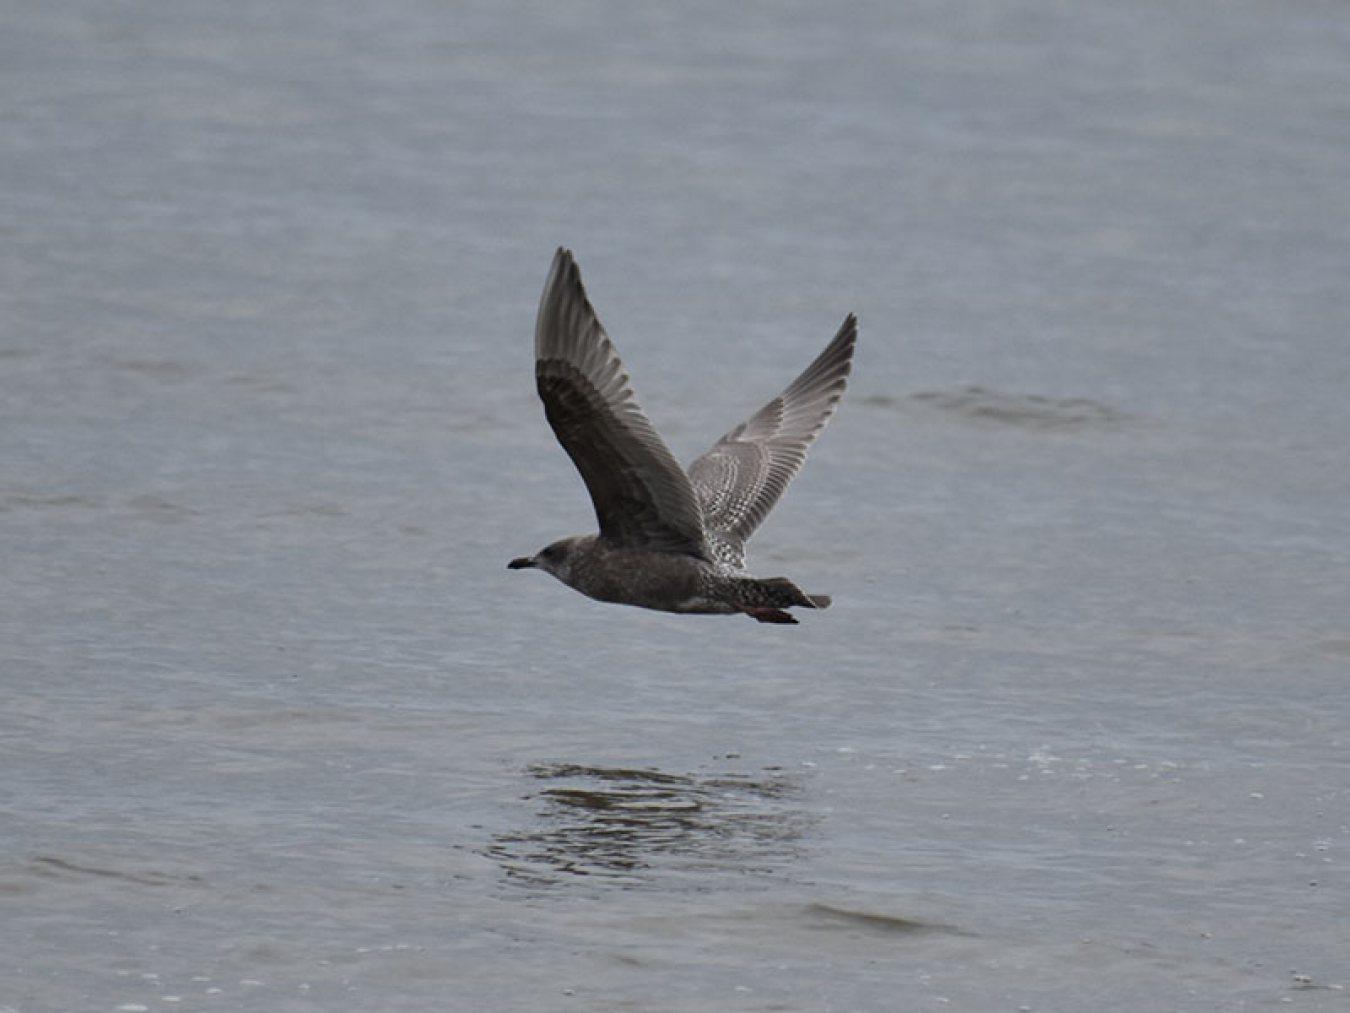 Herring Gull by Mary Halligan